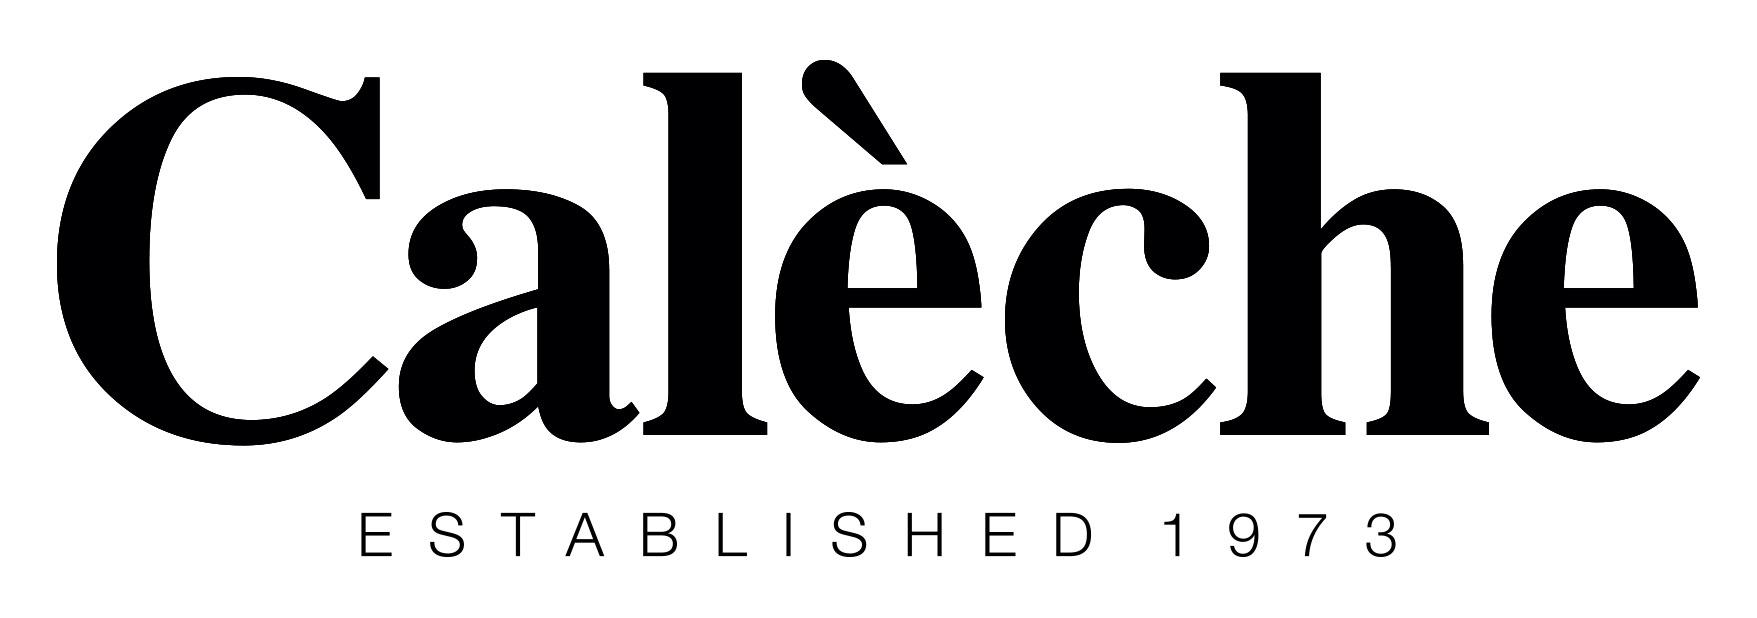 Caleche logo